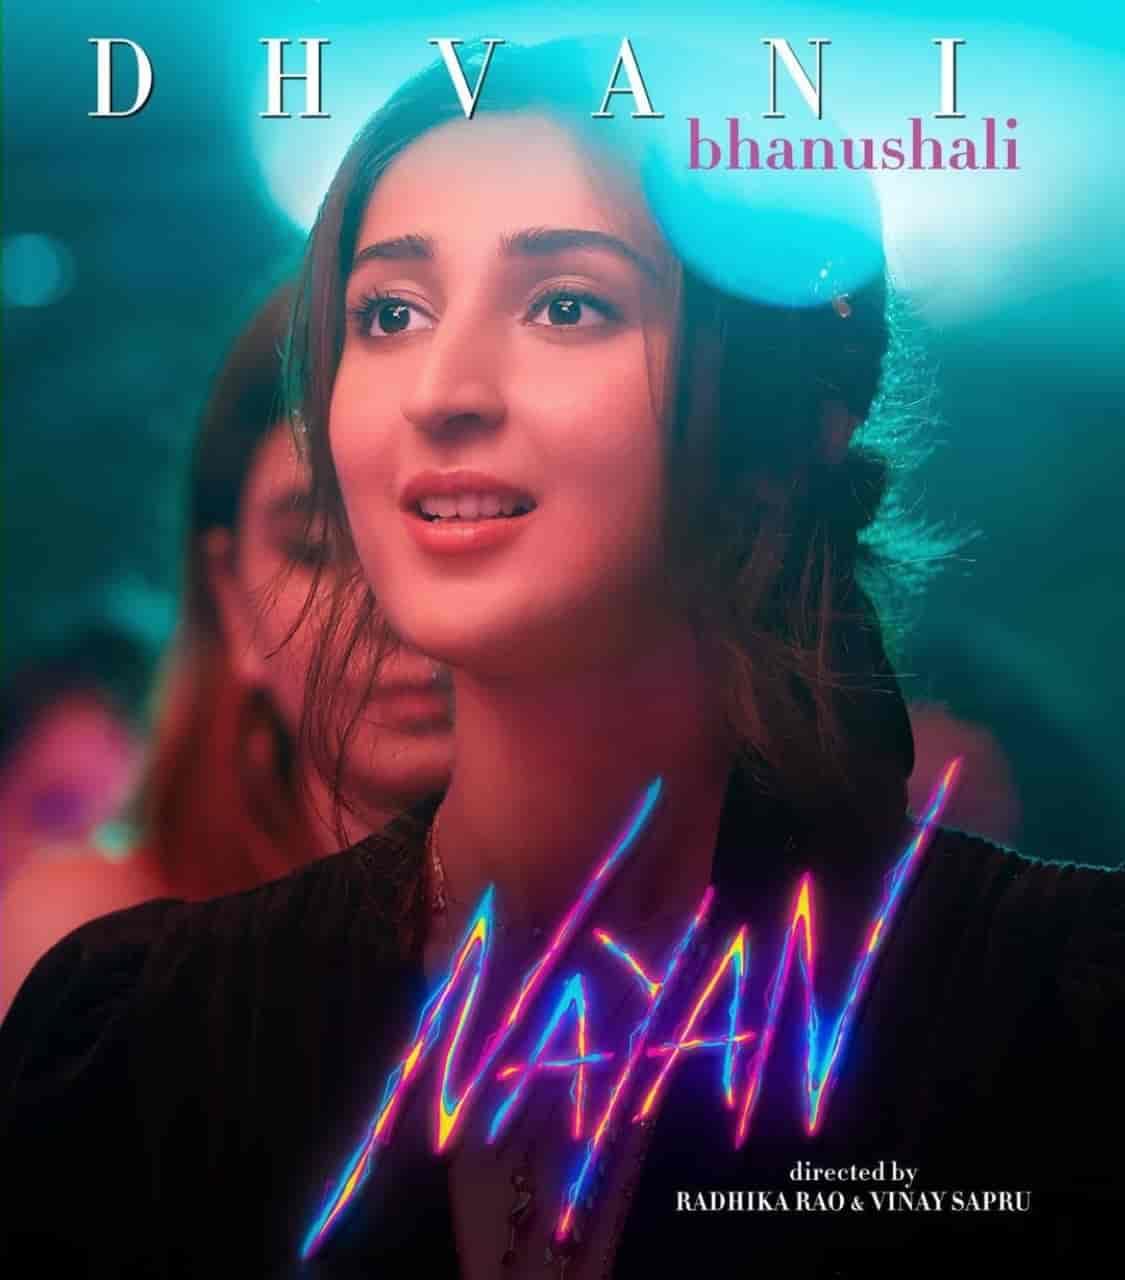 Nayan Chords Dhvani Banushali | Jubin nautiyal Nayan guitar chords